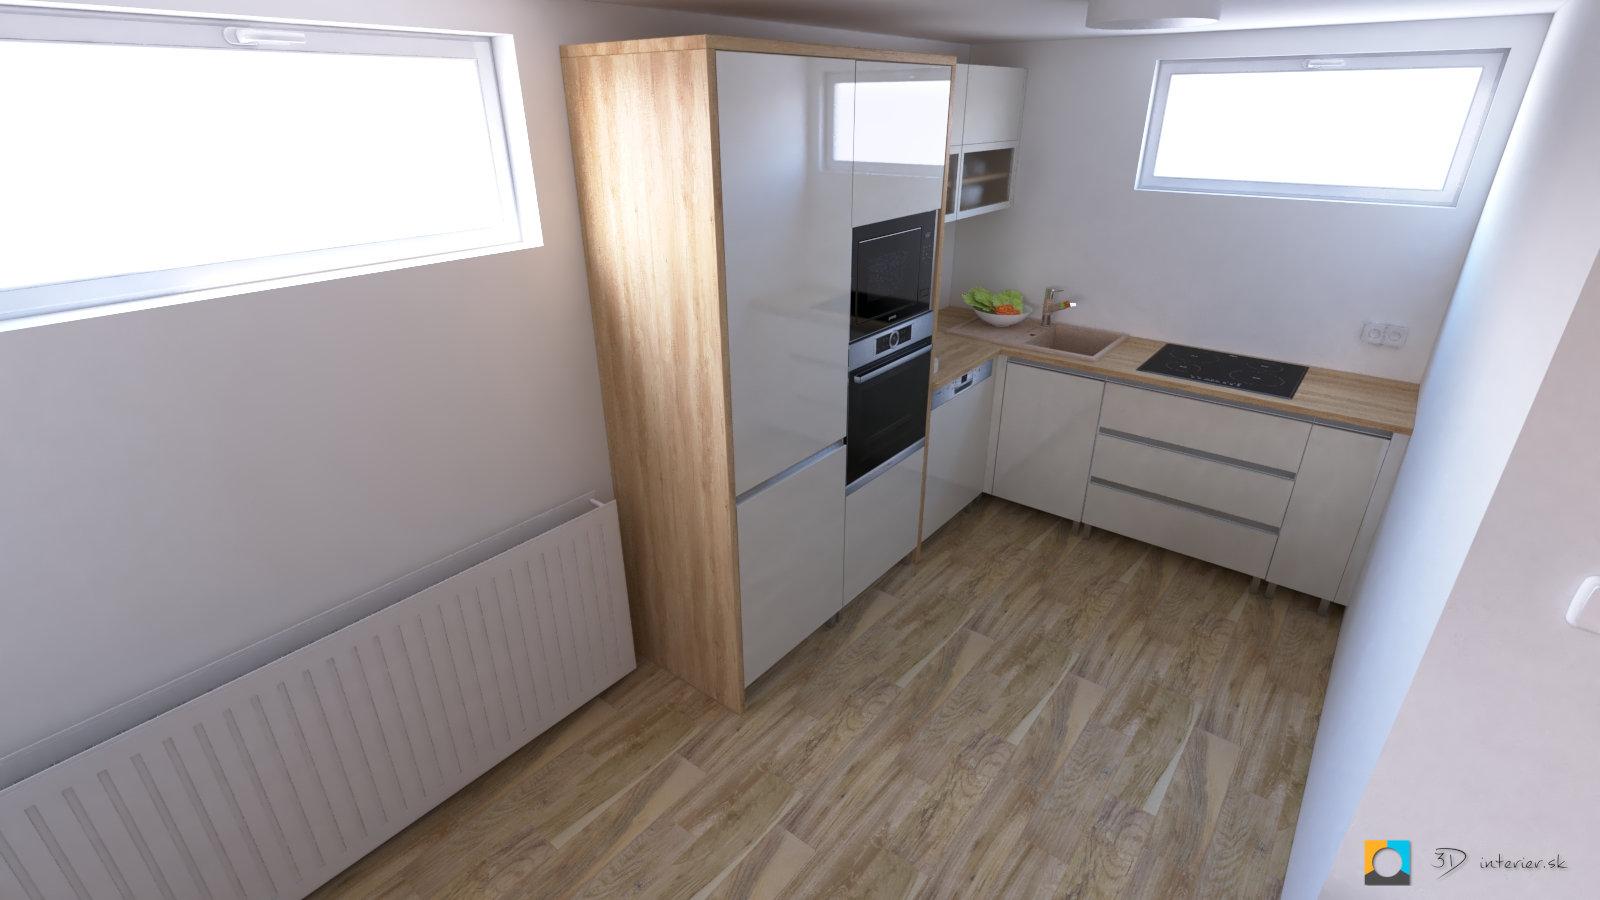 dizajnovy navrh interieru kuchyne